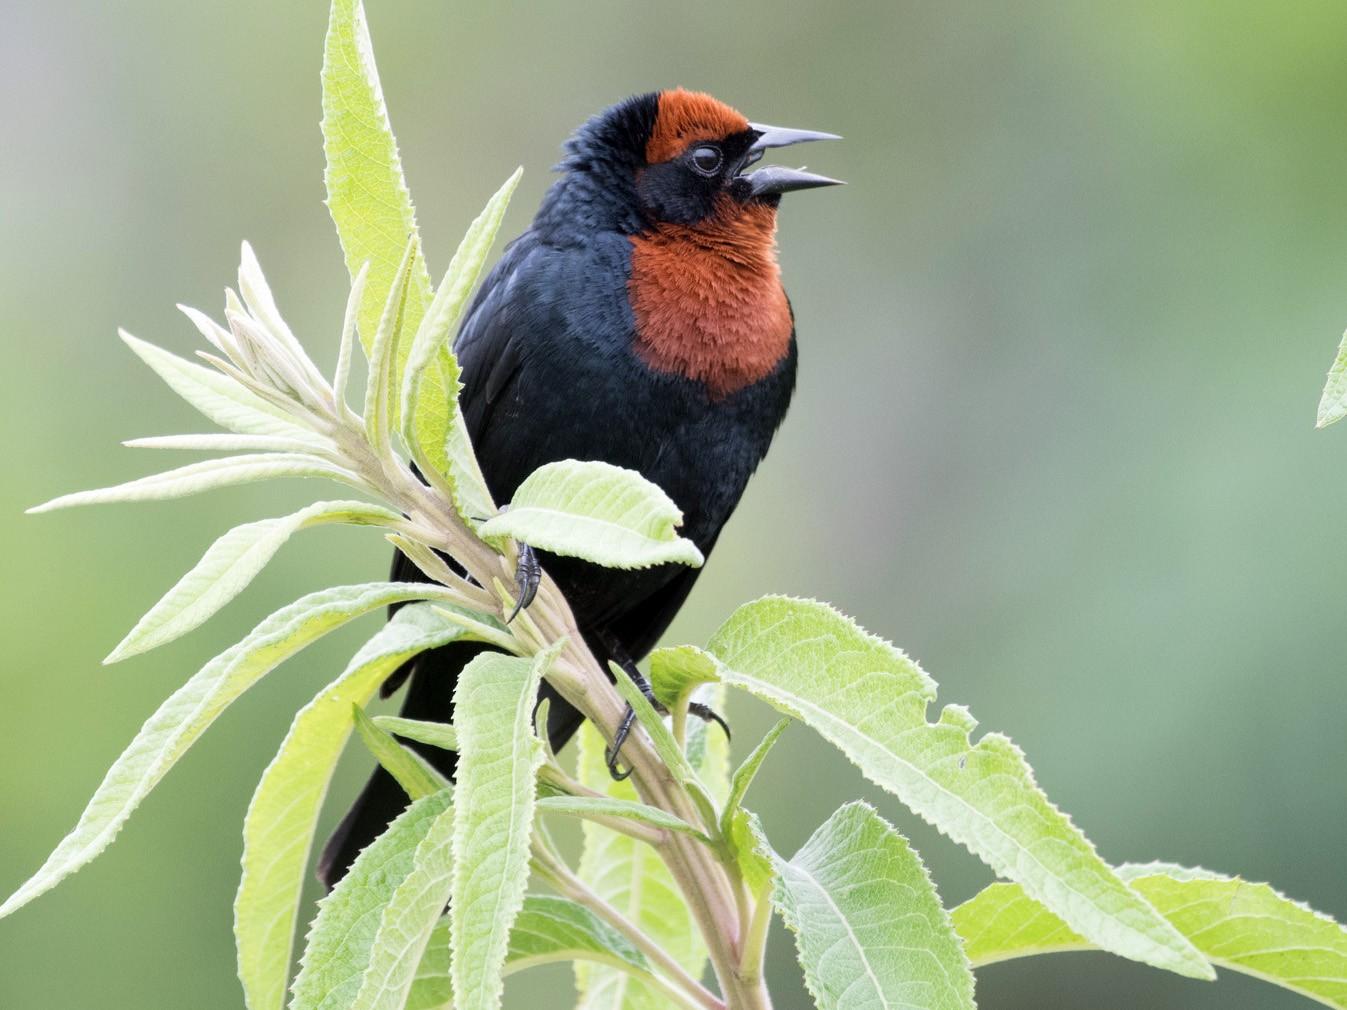 Chestnut-capped Blackbird - Flavio Moraes